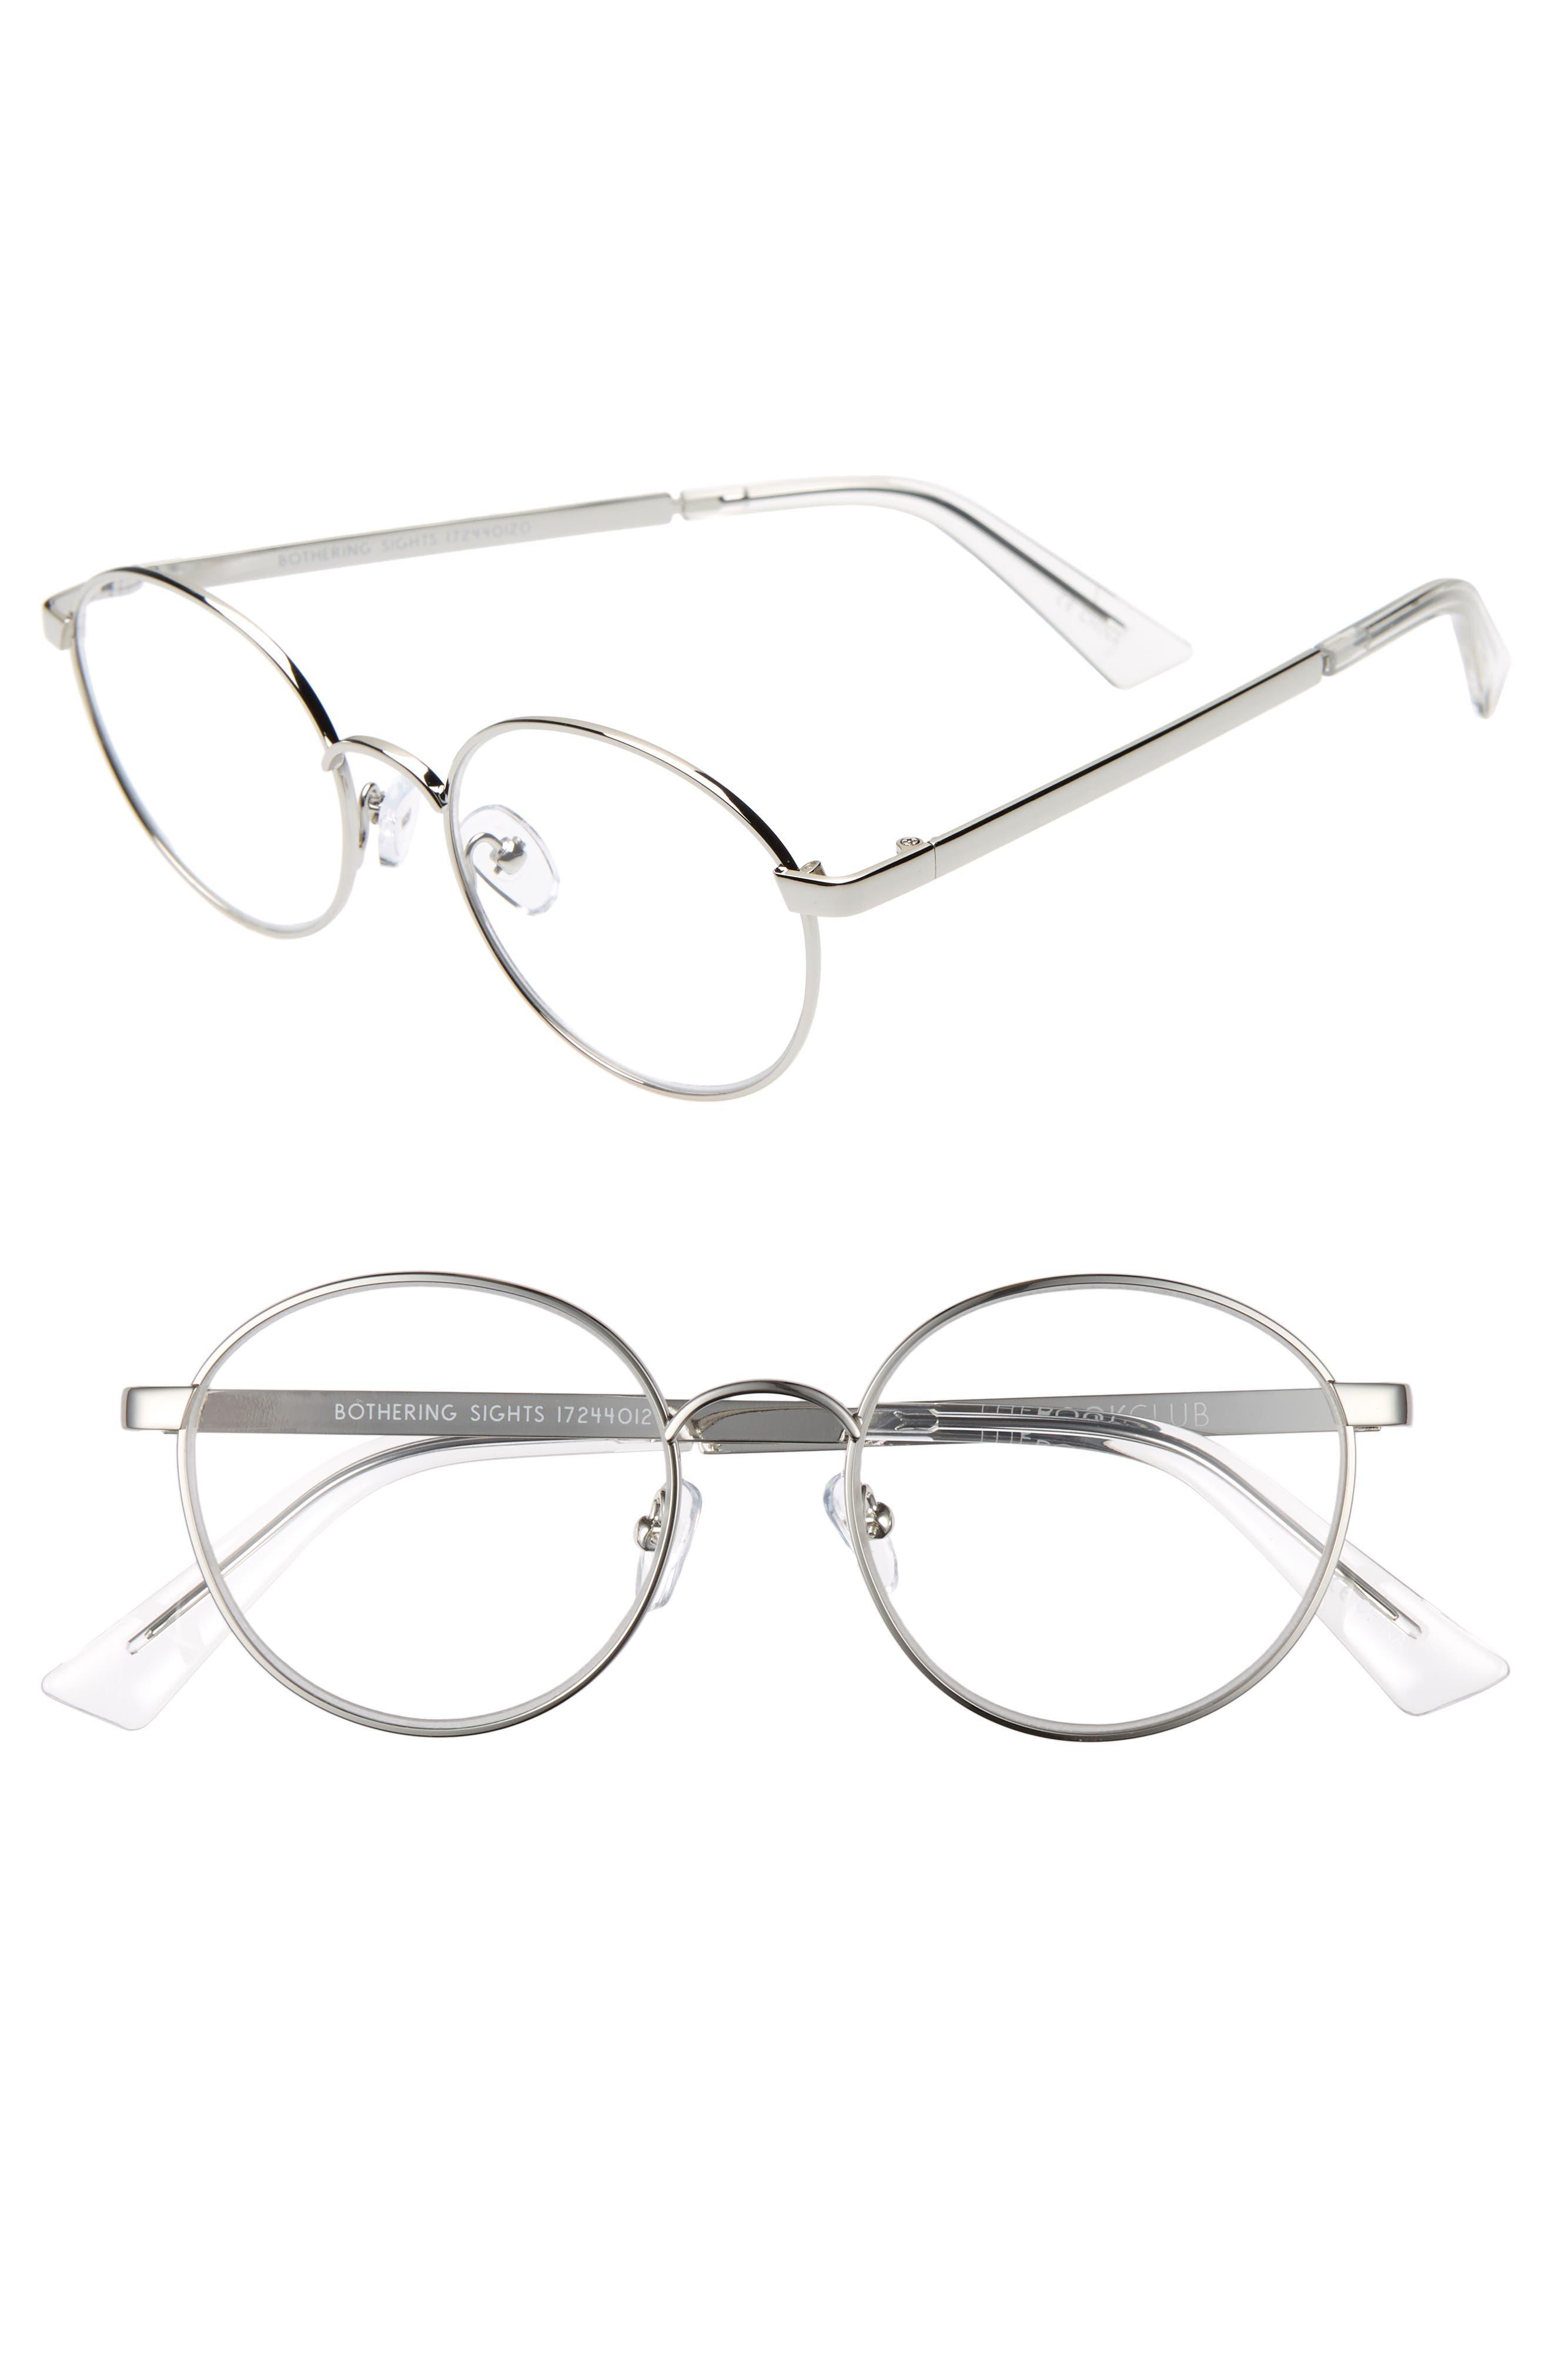 Bothering Sights 51mm Reading Glasses,                             Main thumbnail 1, color,                             040